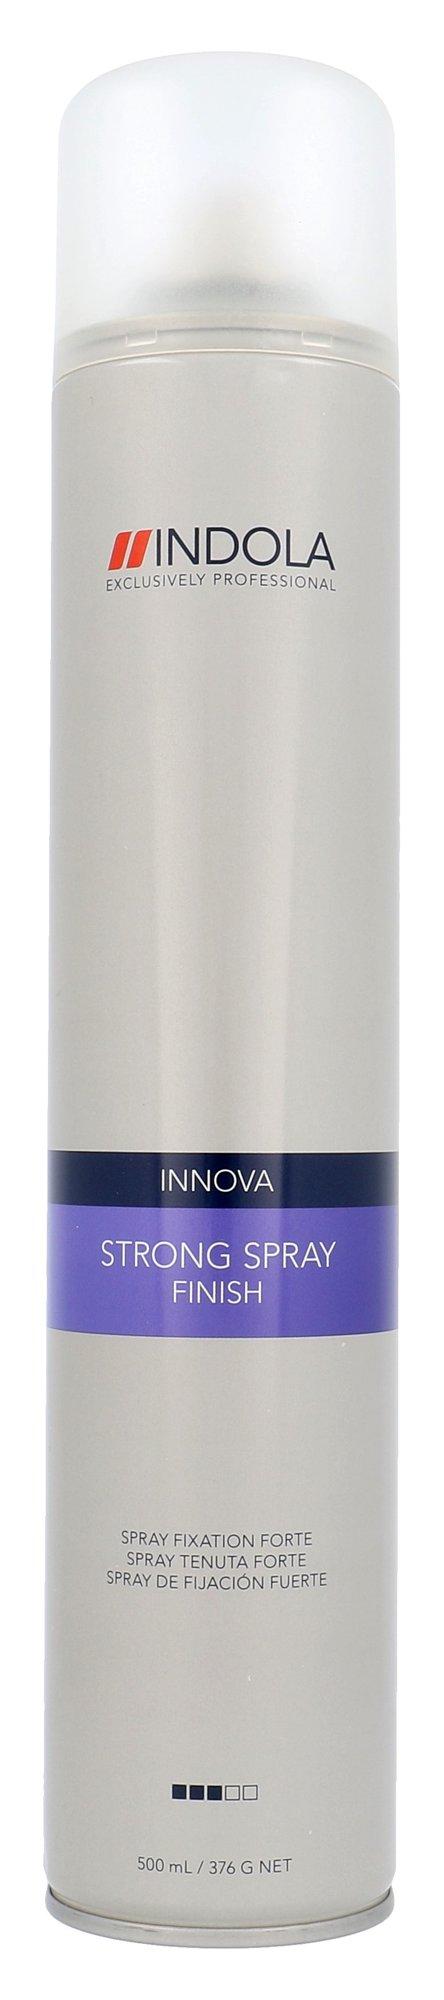 Indola Innova Finish Cosmetic 500ml  Strong Spray